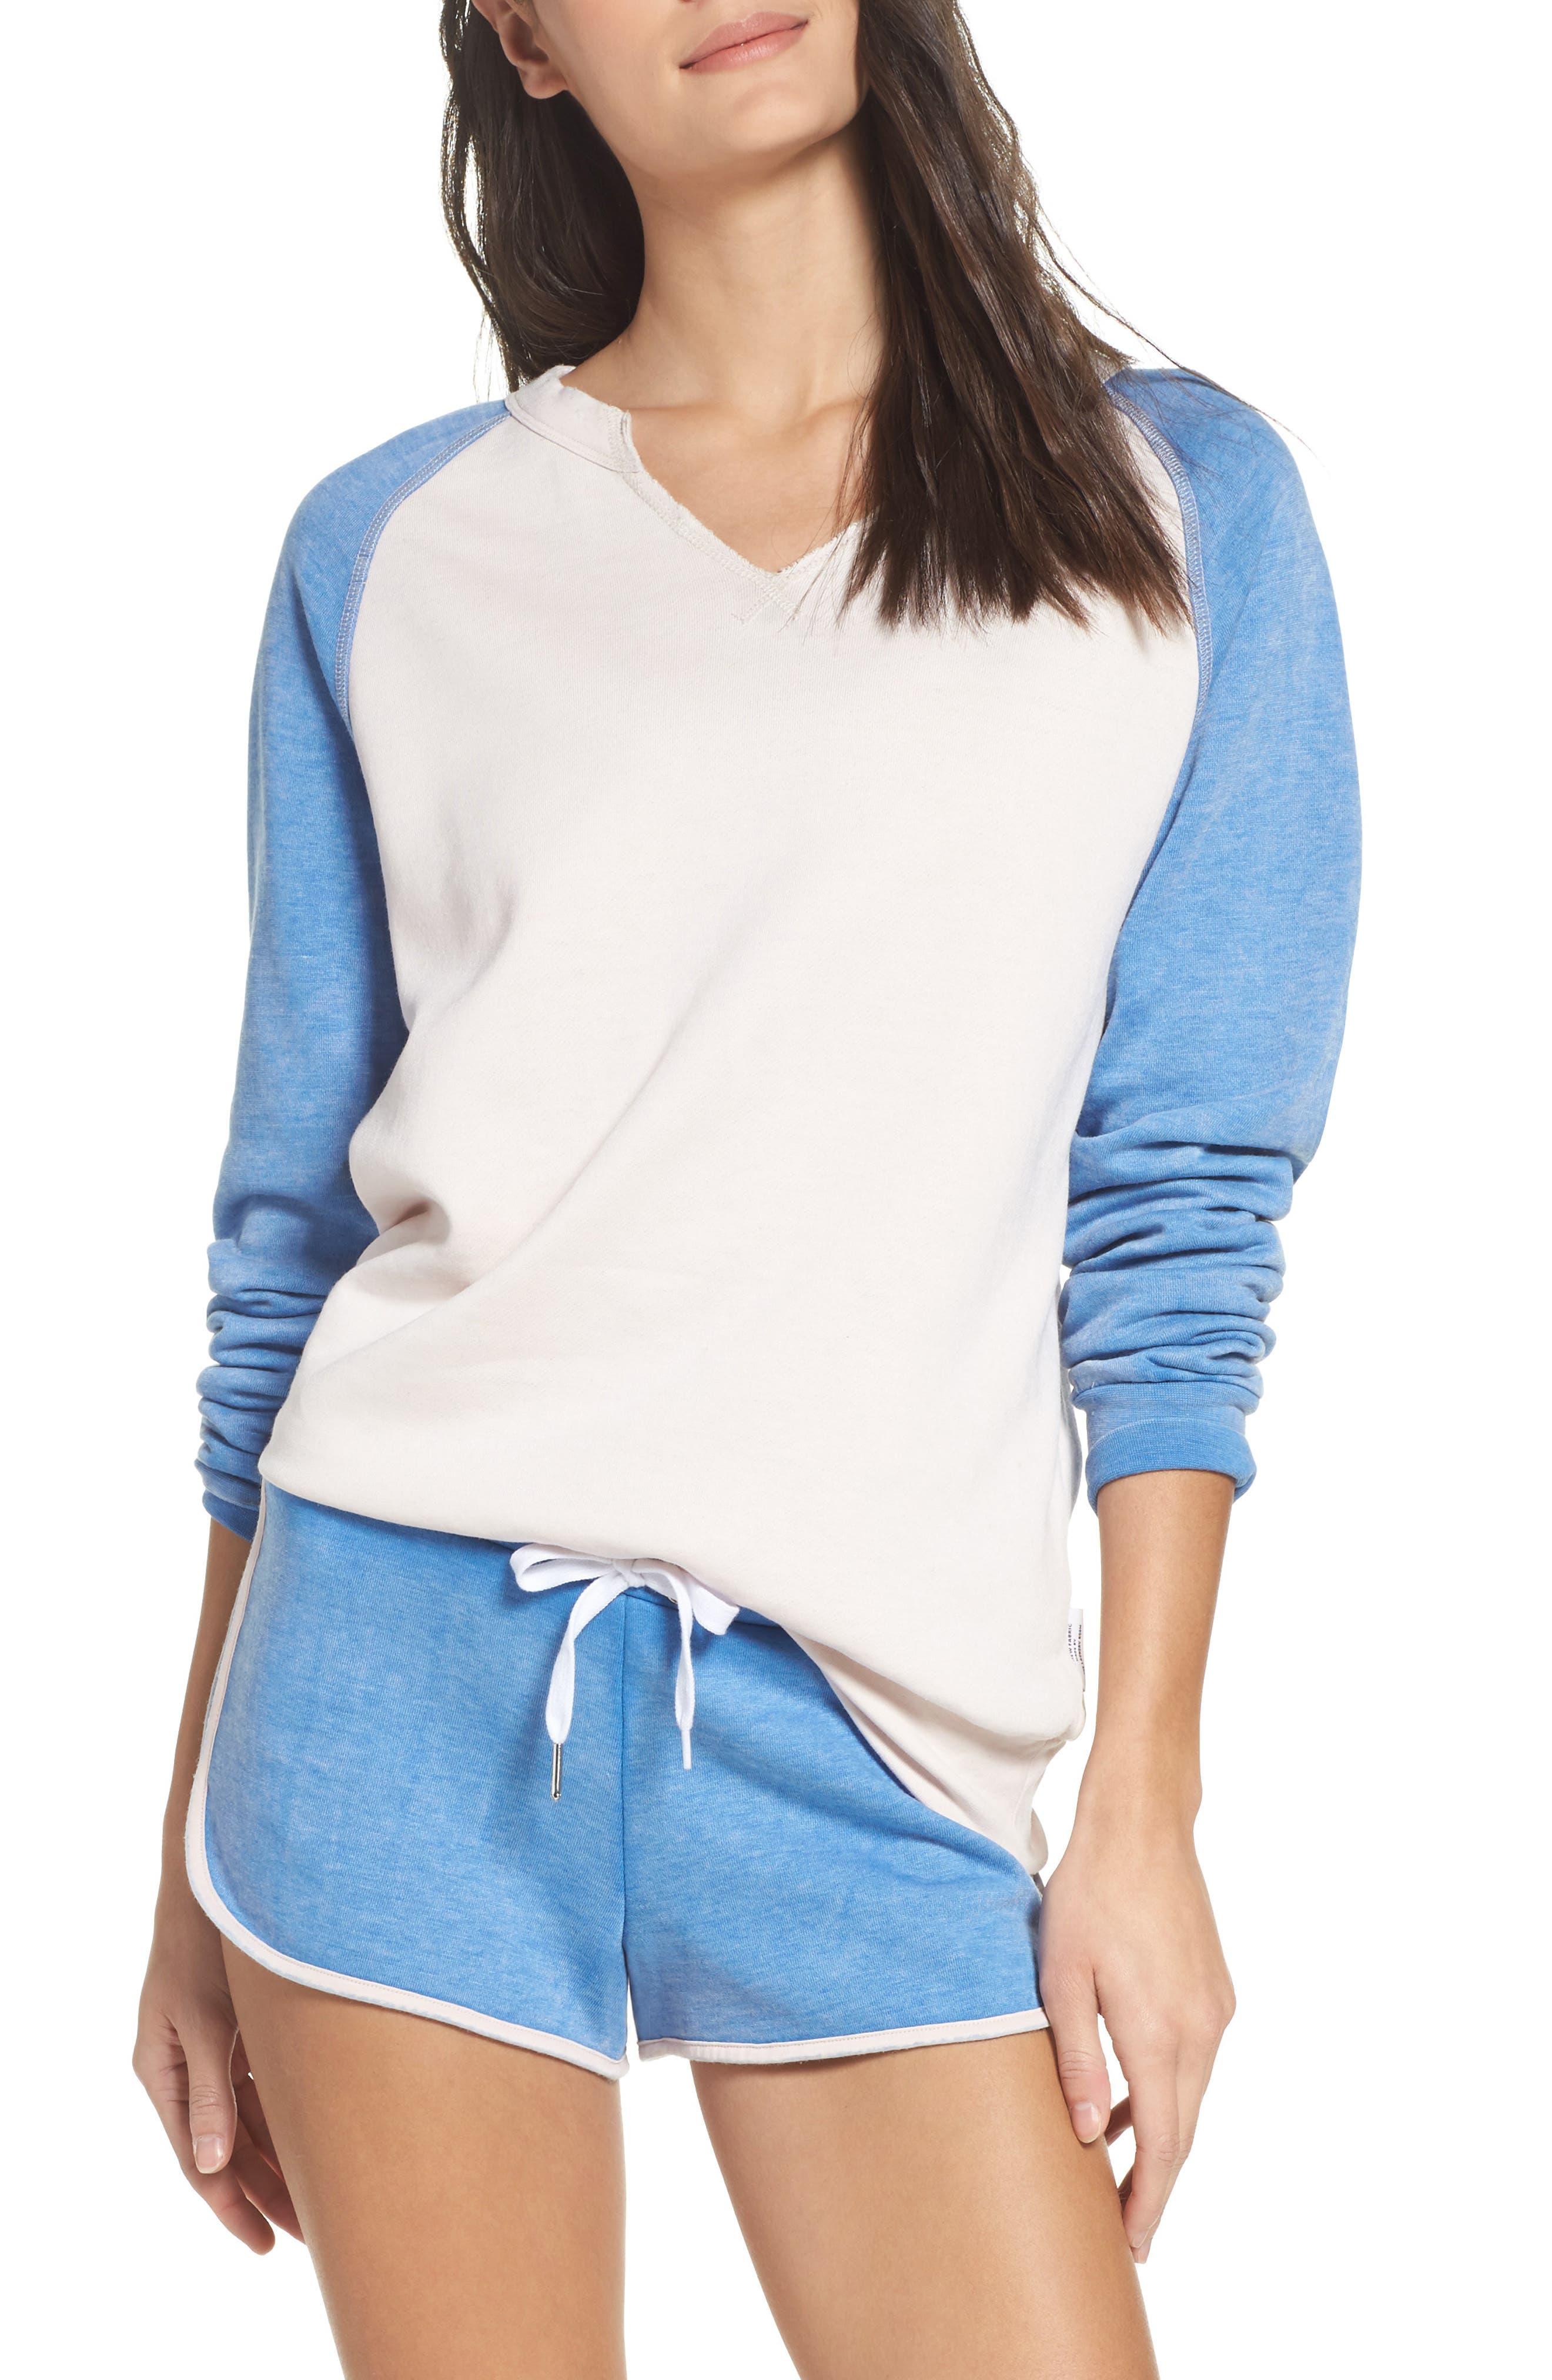 The Laundry Room Sweatshirt